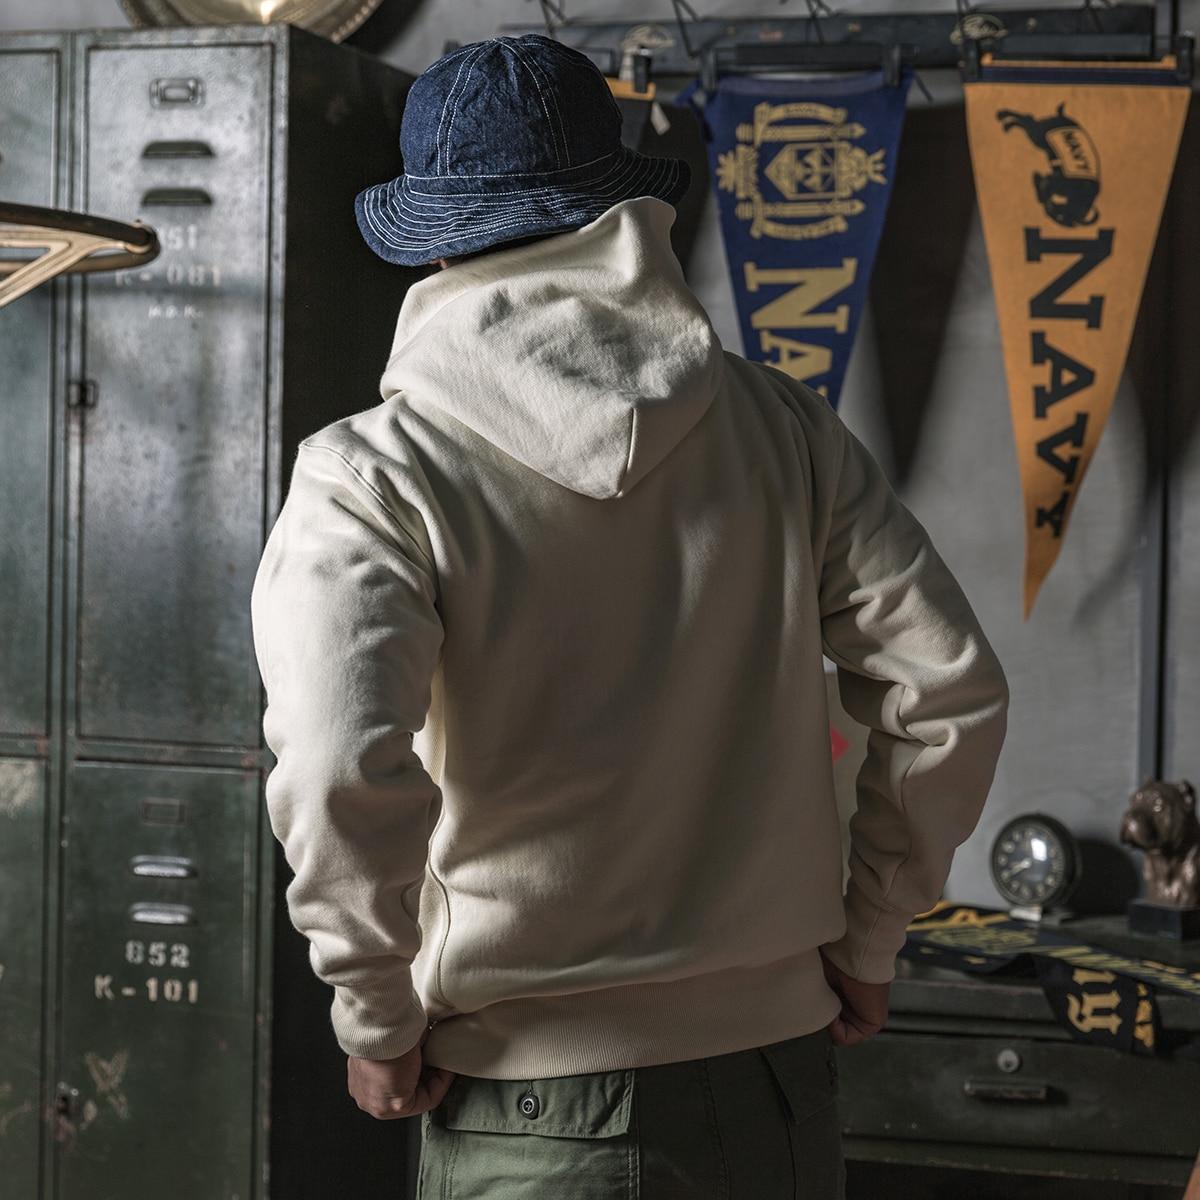 Bronson Vintage Sportwear Hooded Sweatshirts 600gsm Cotton Fleece Men's Hoodies